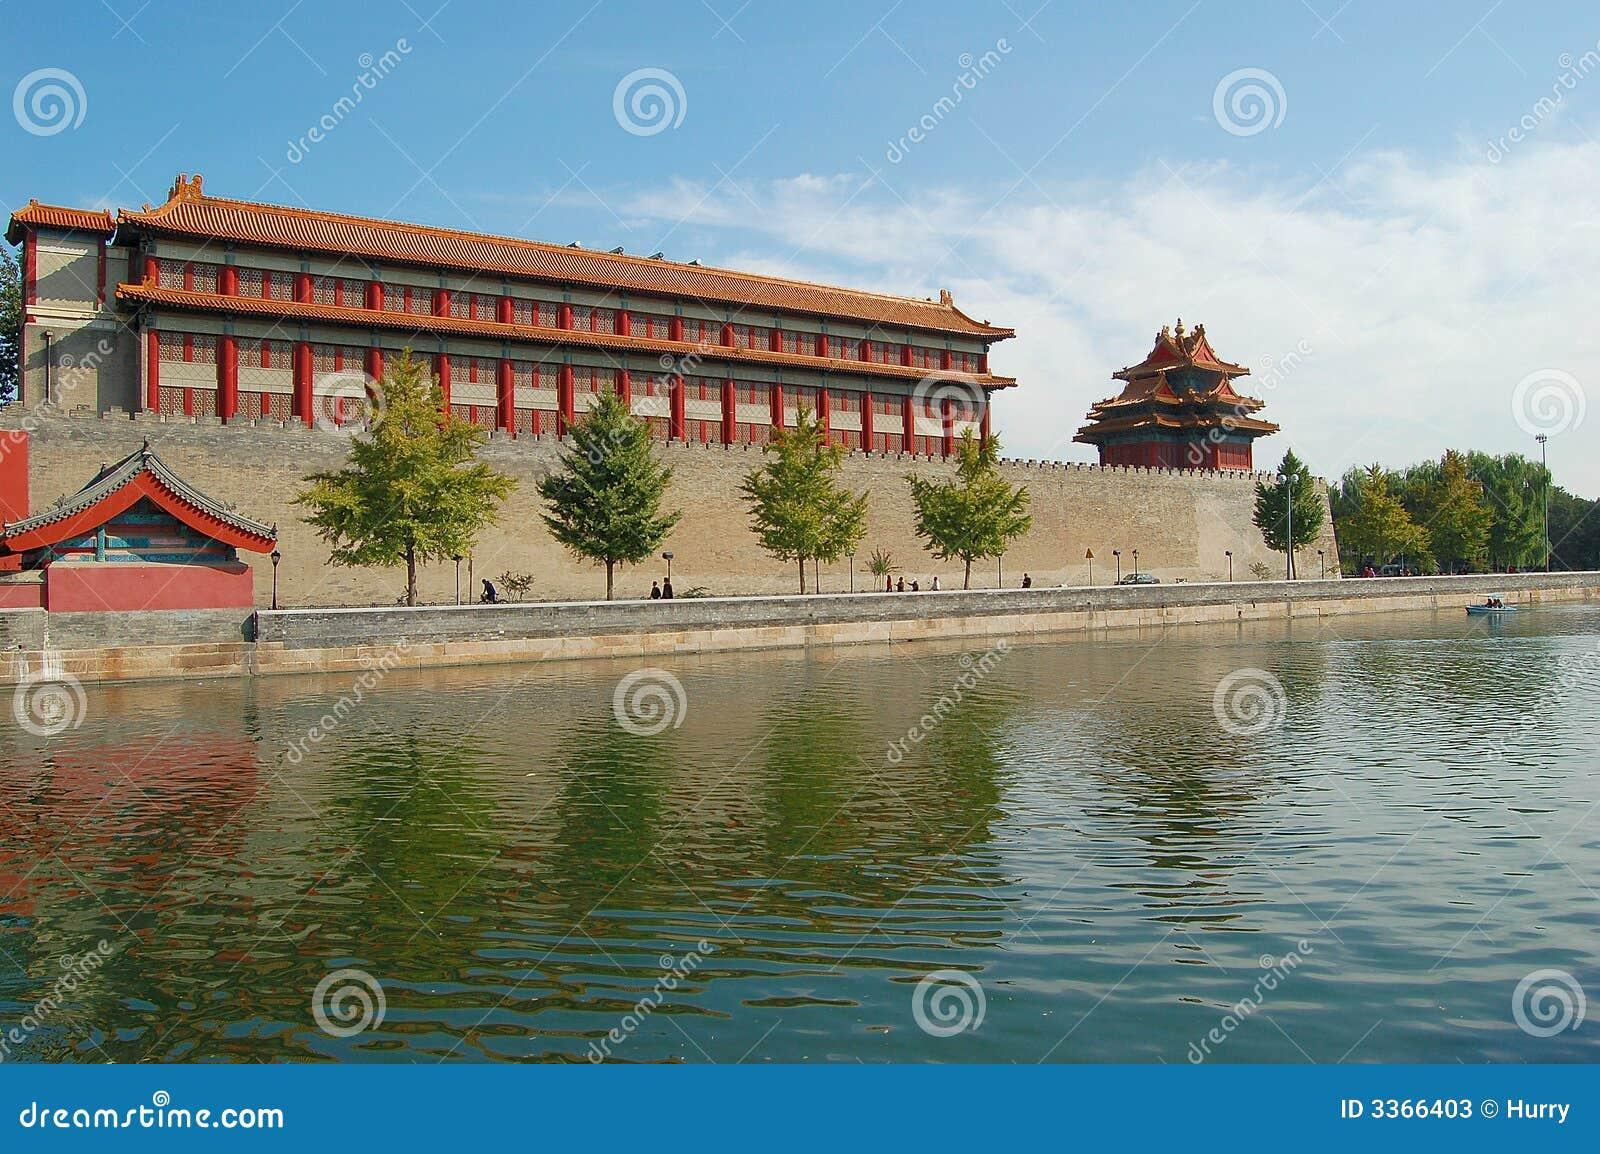 Download Moat & Turret, Forbidden City Stock Image - Image of tourism, corner: 3366403